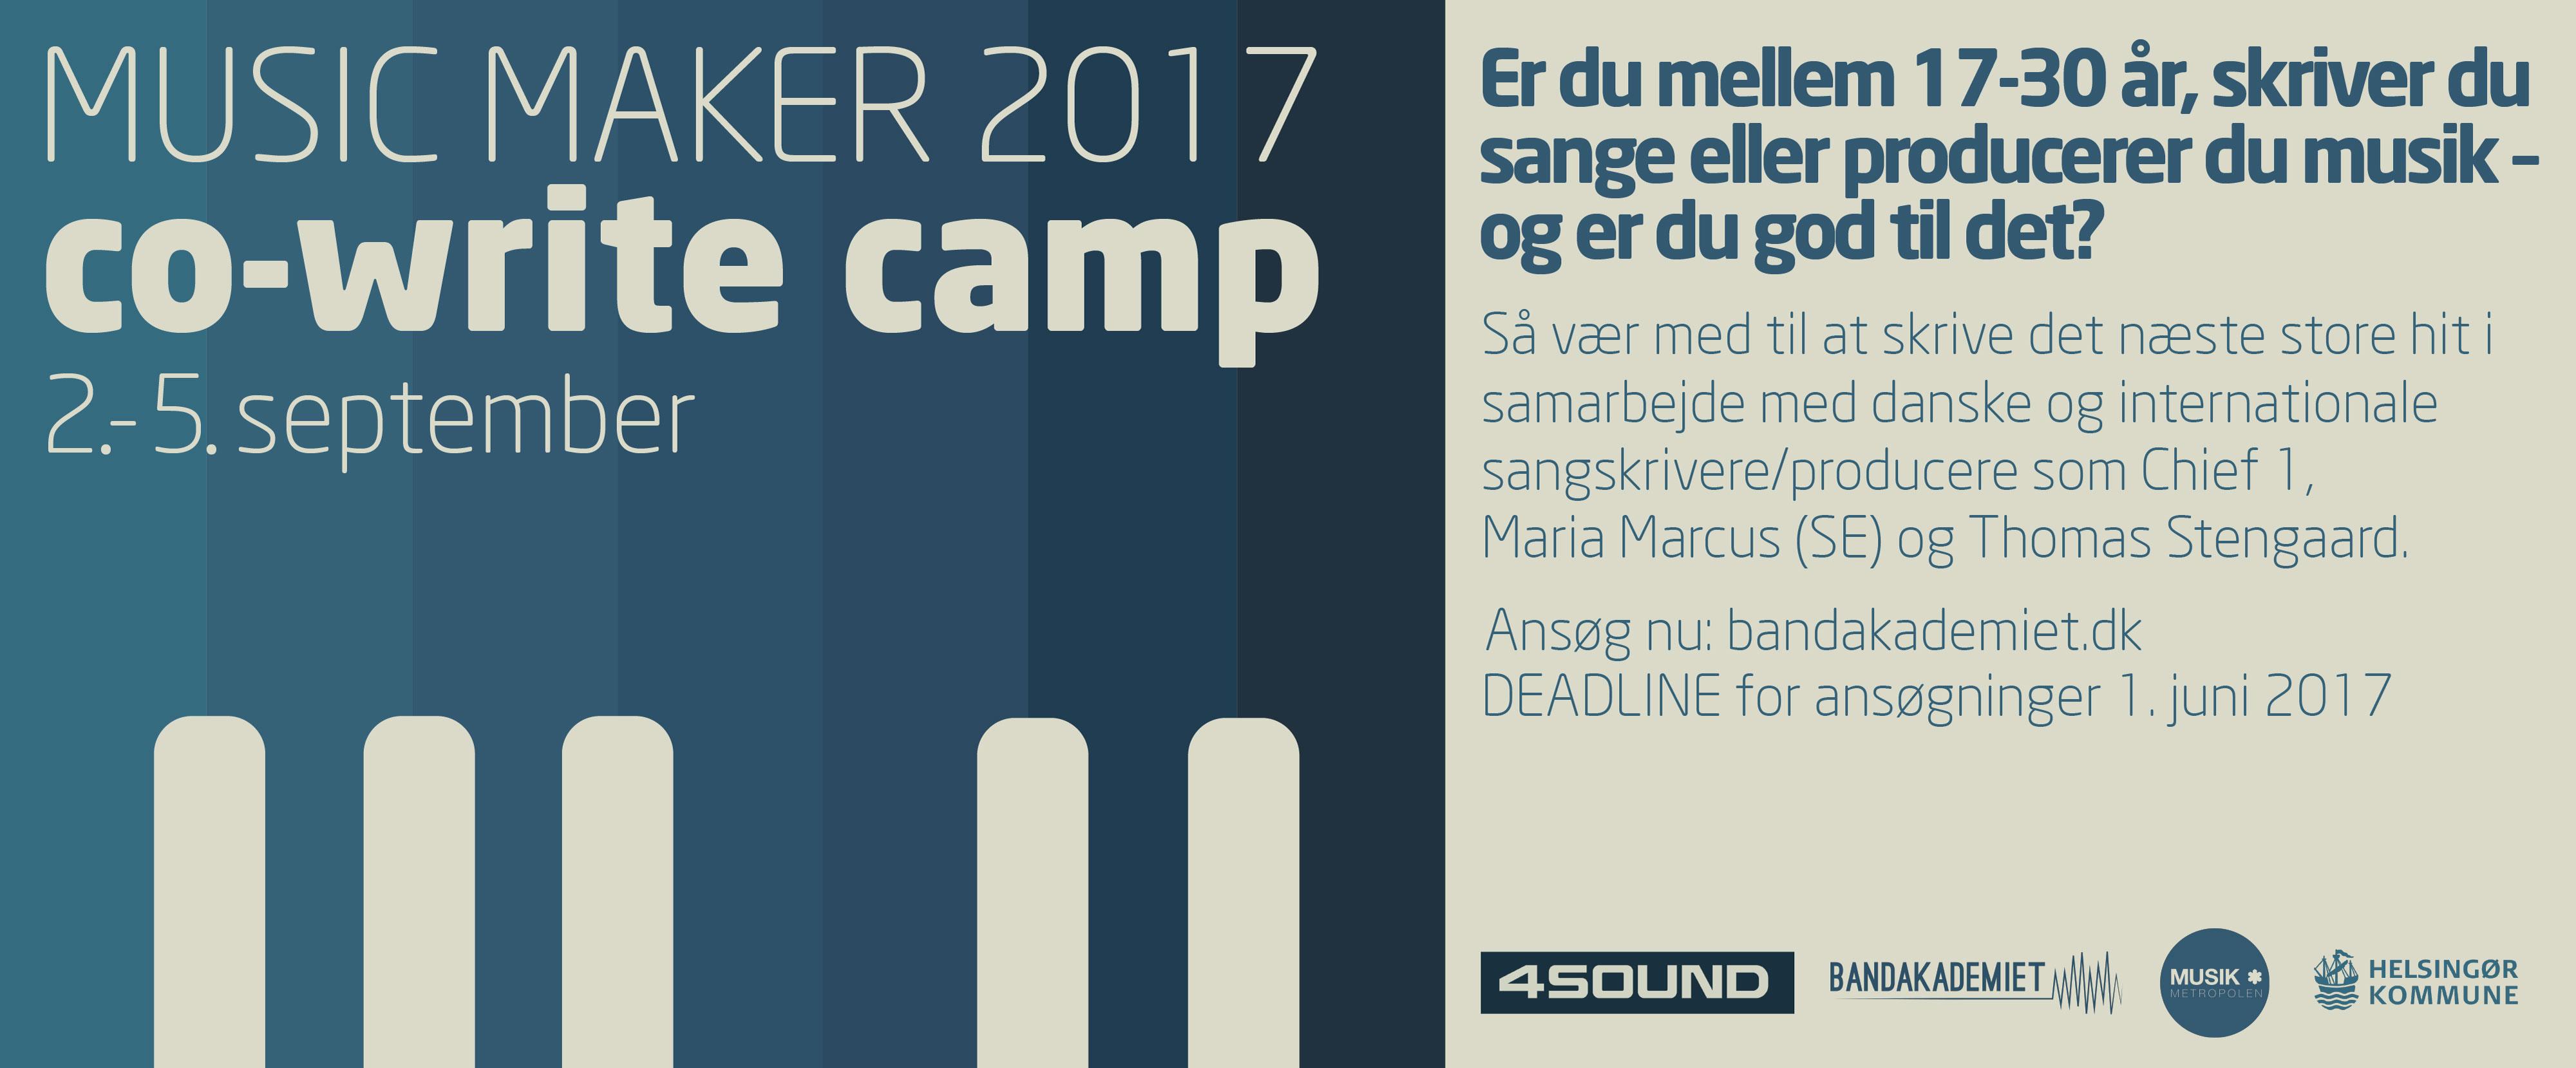 Co-write camp, flyer.jpg